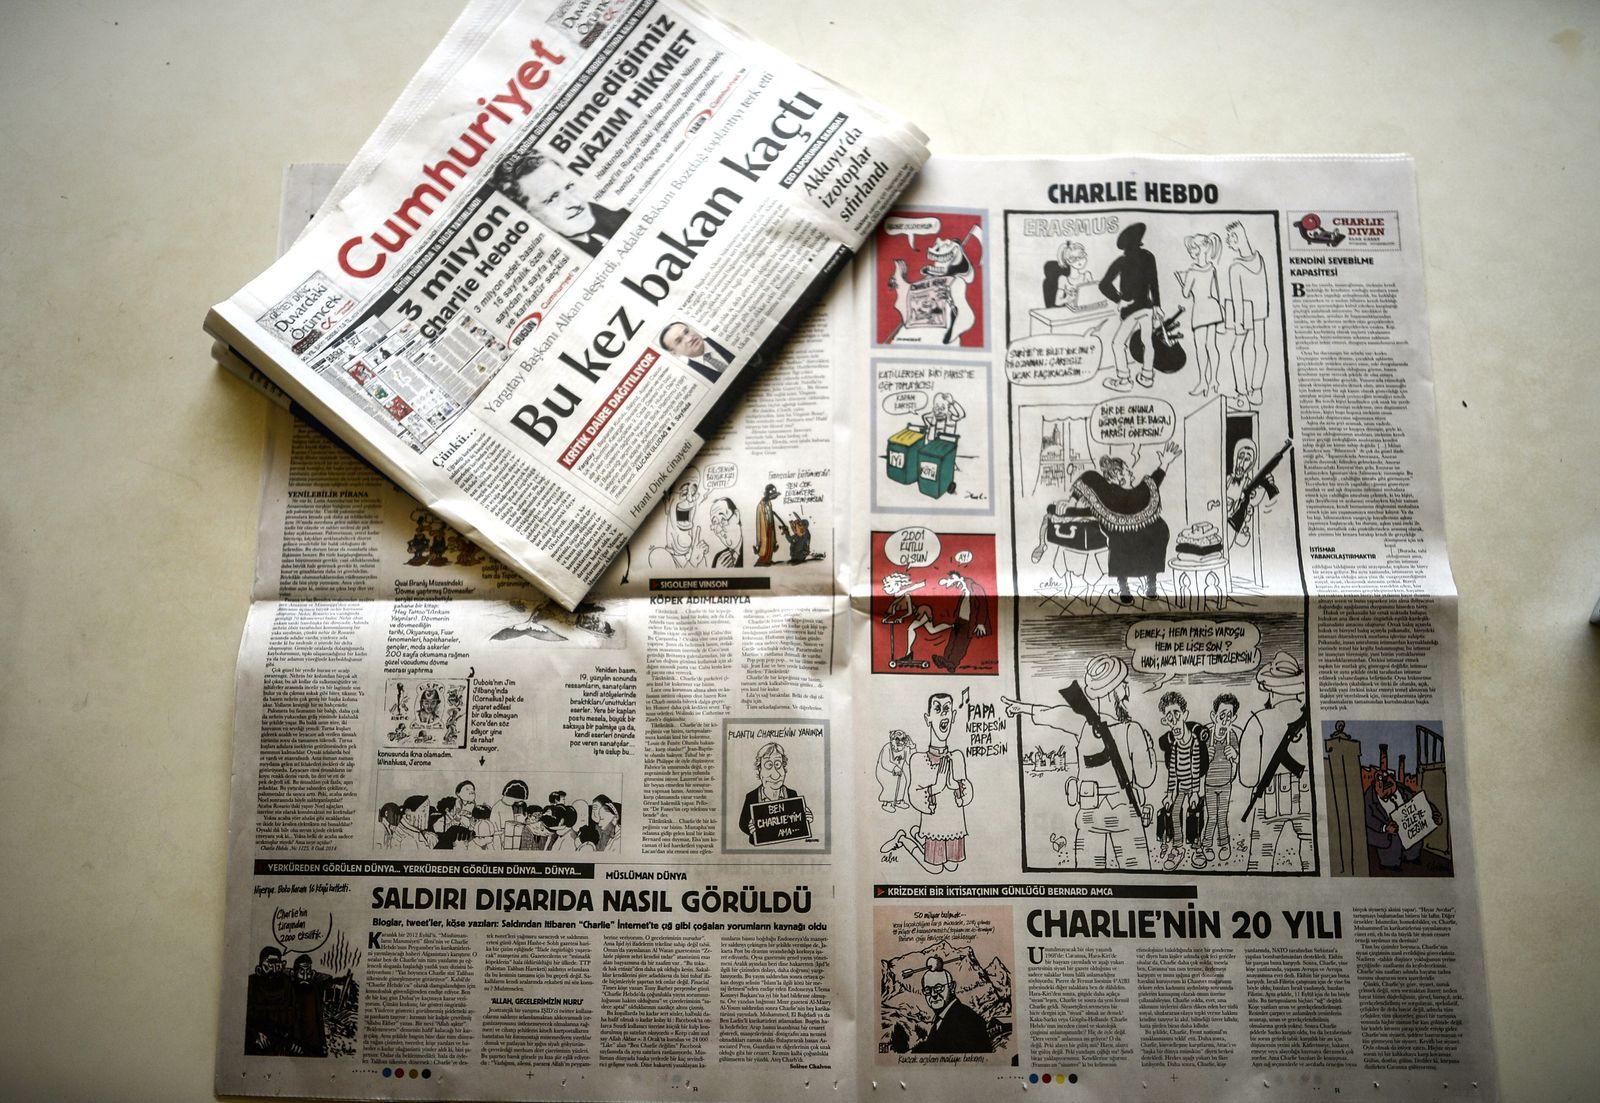 Türkei / Cumhuriyet Daily / Charlie Hebdo